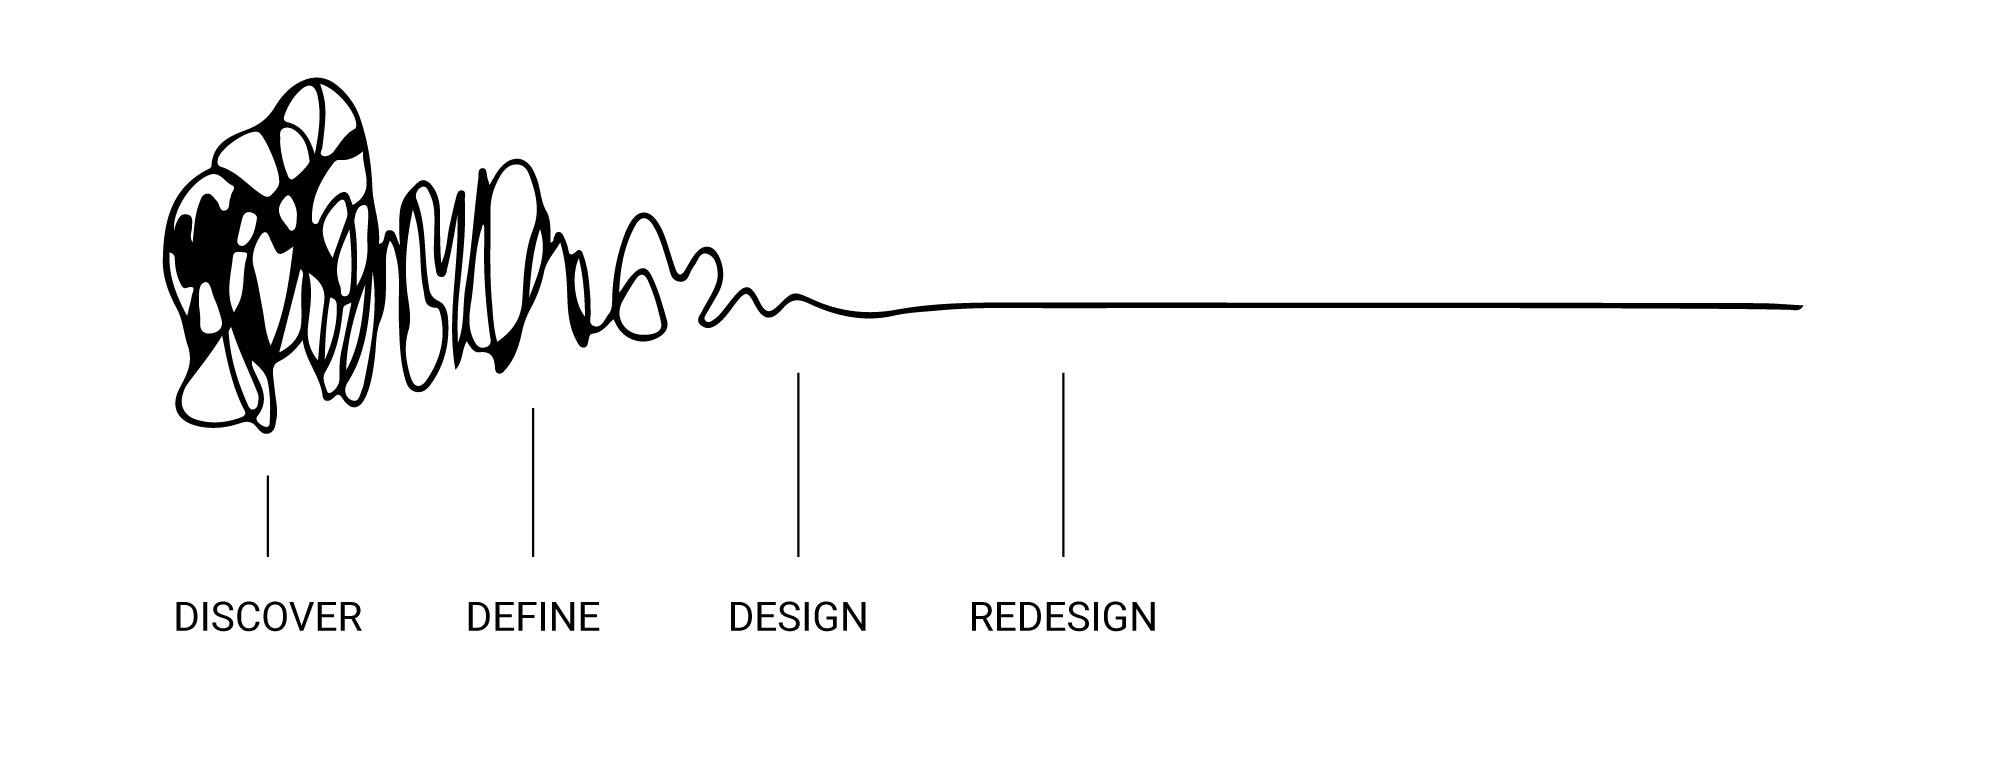 my_design-squiggle.jpg